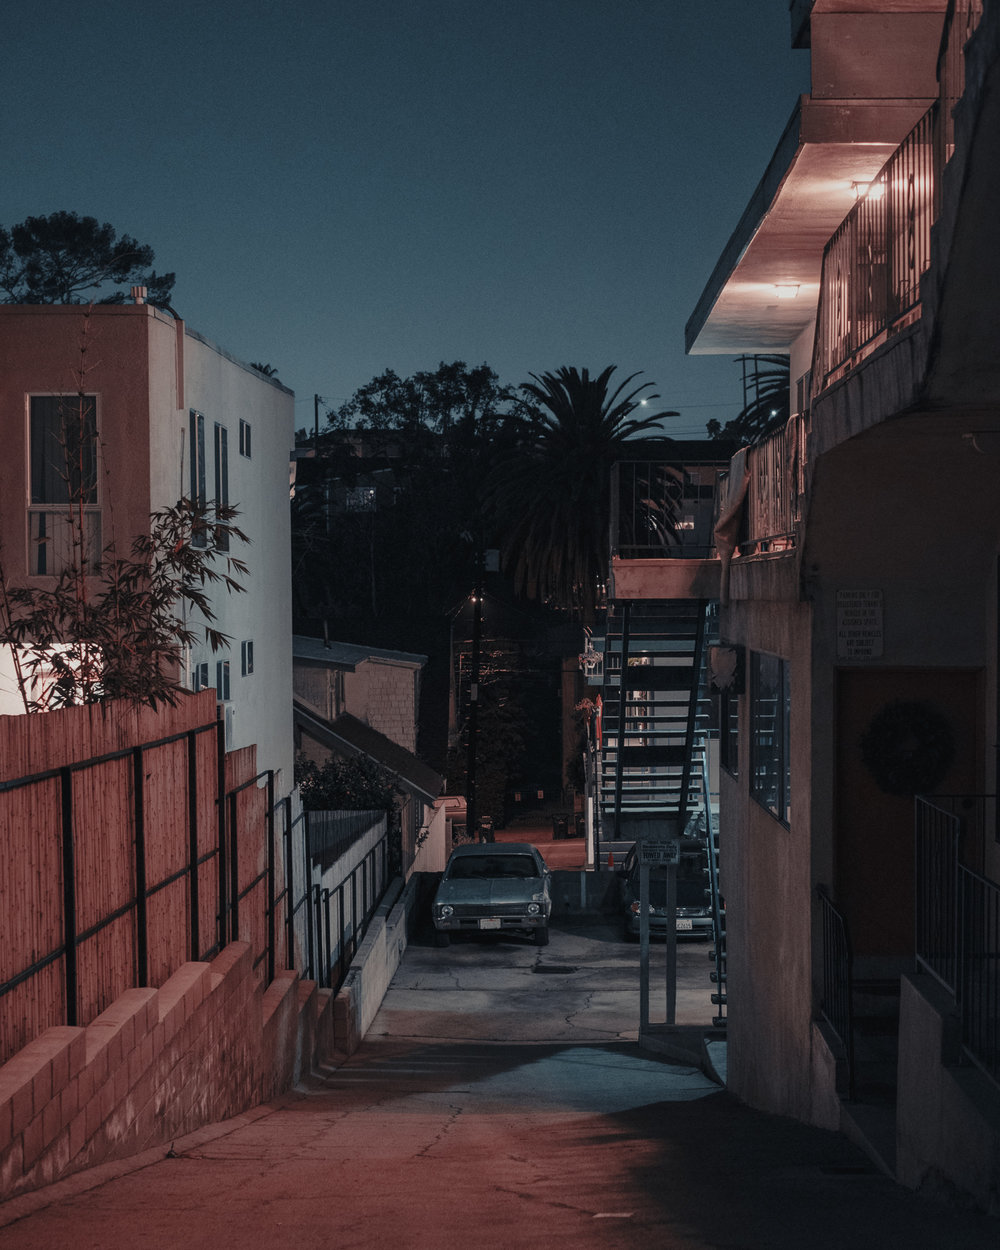 Nights-35.jpg